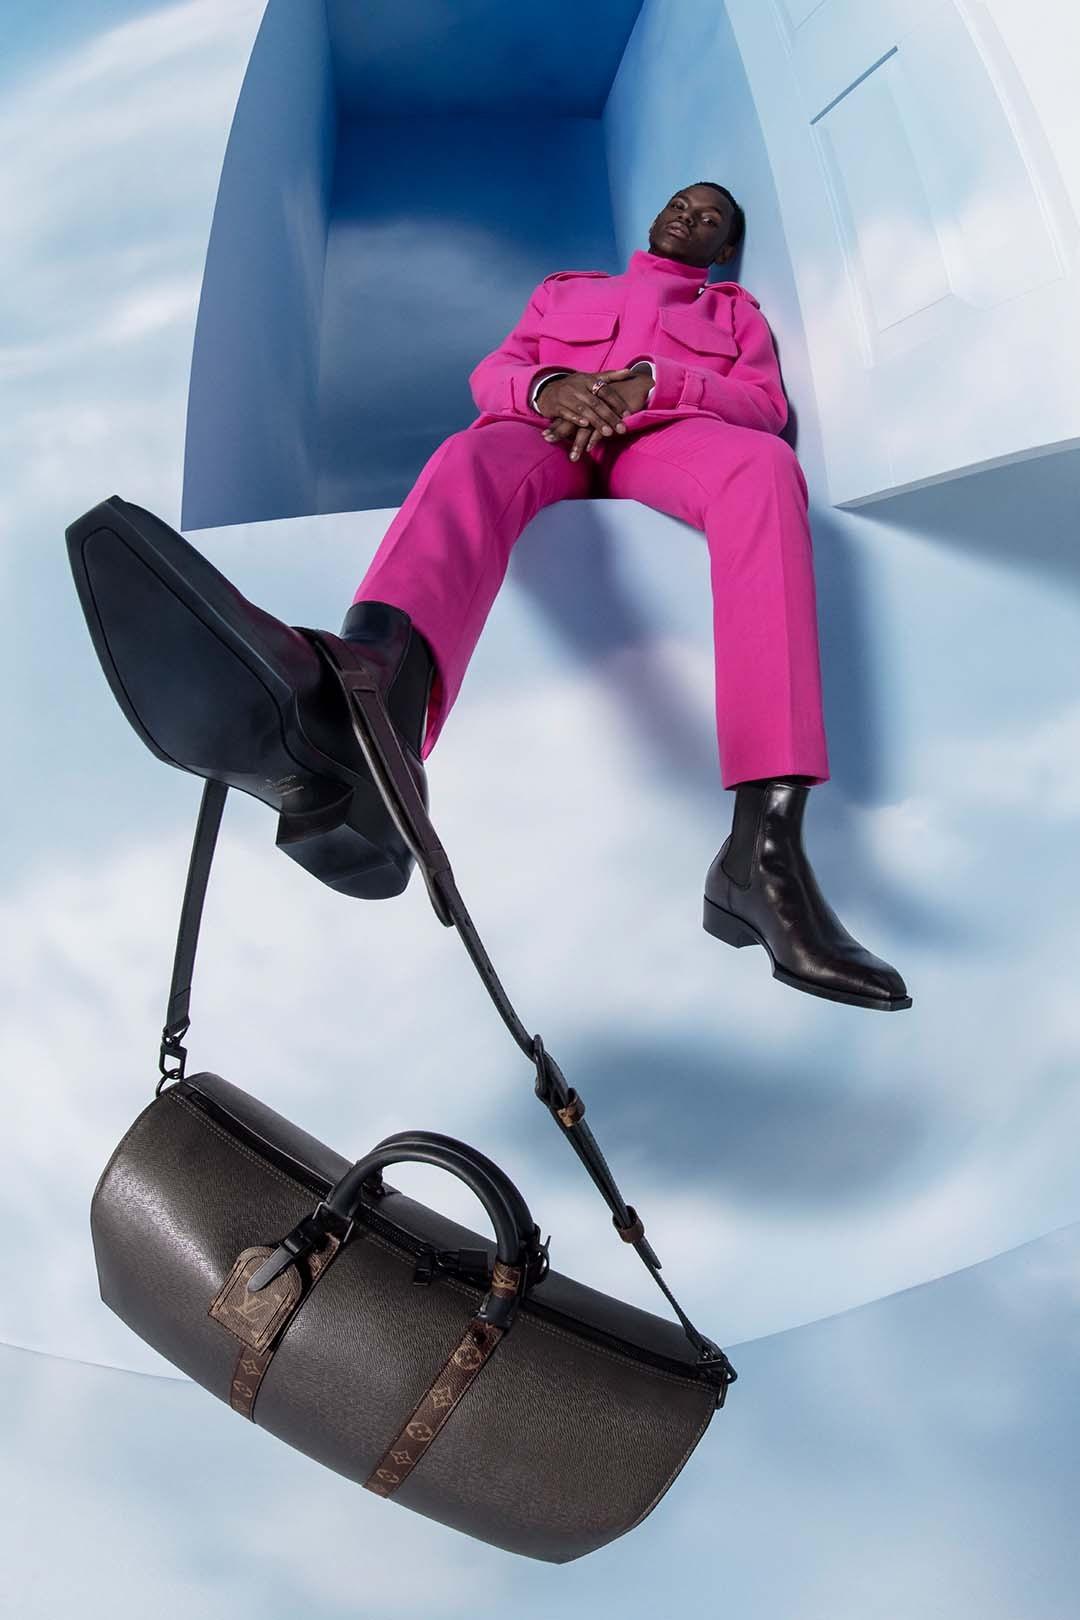 Completo pink e borsa LV